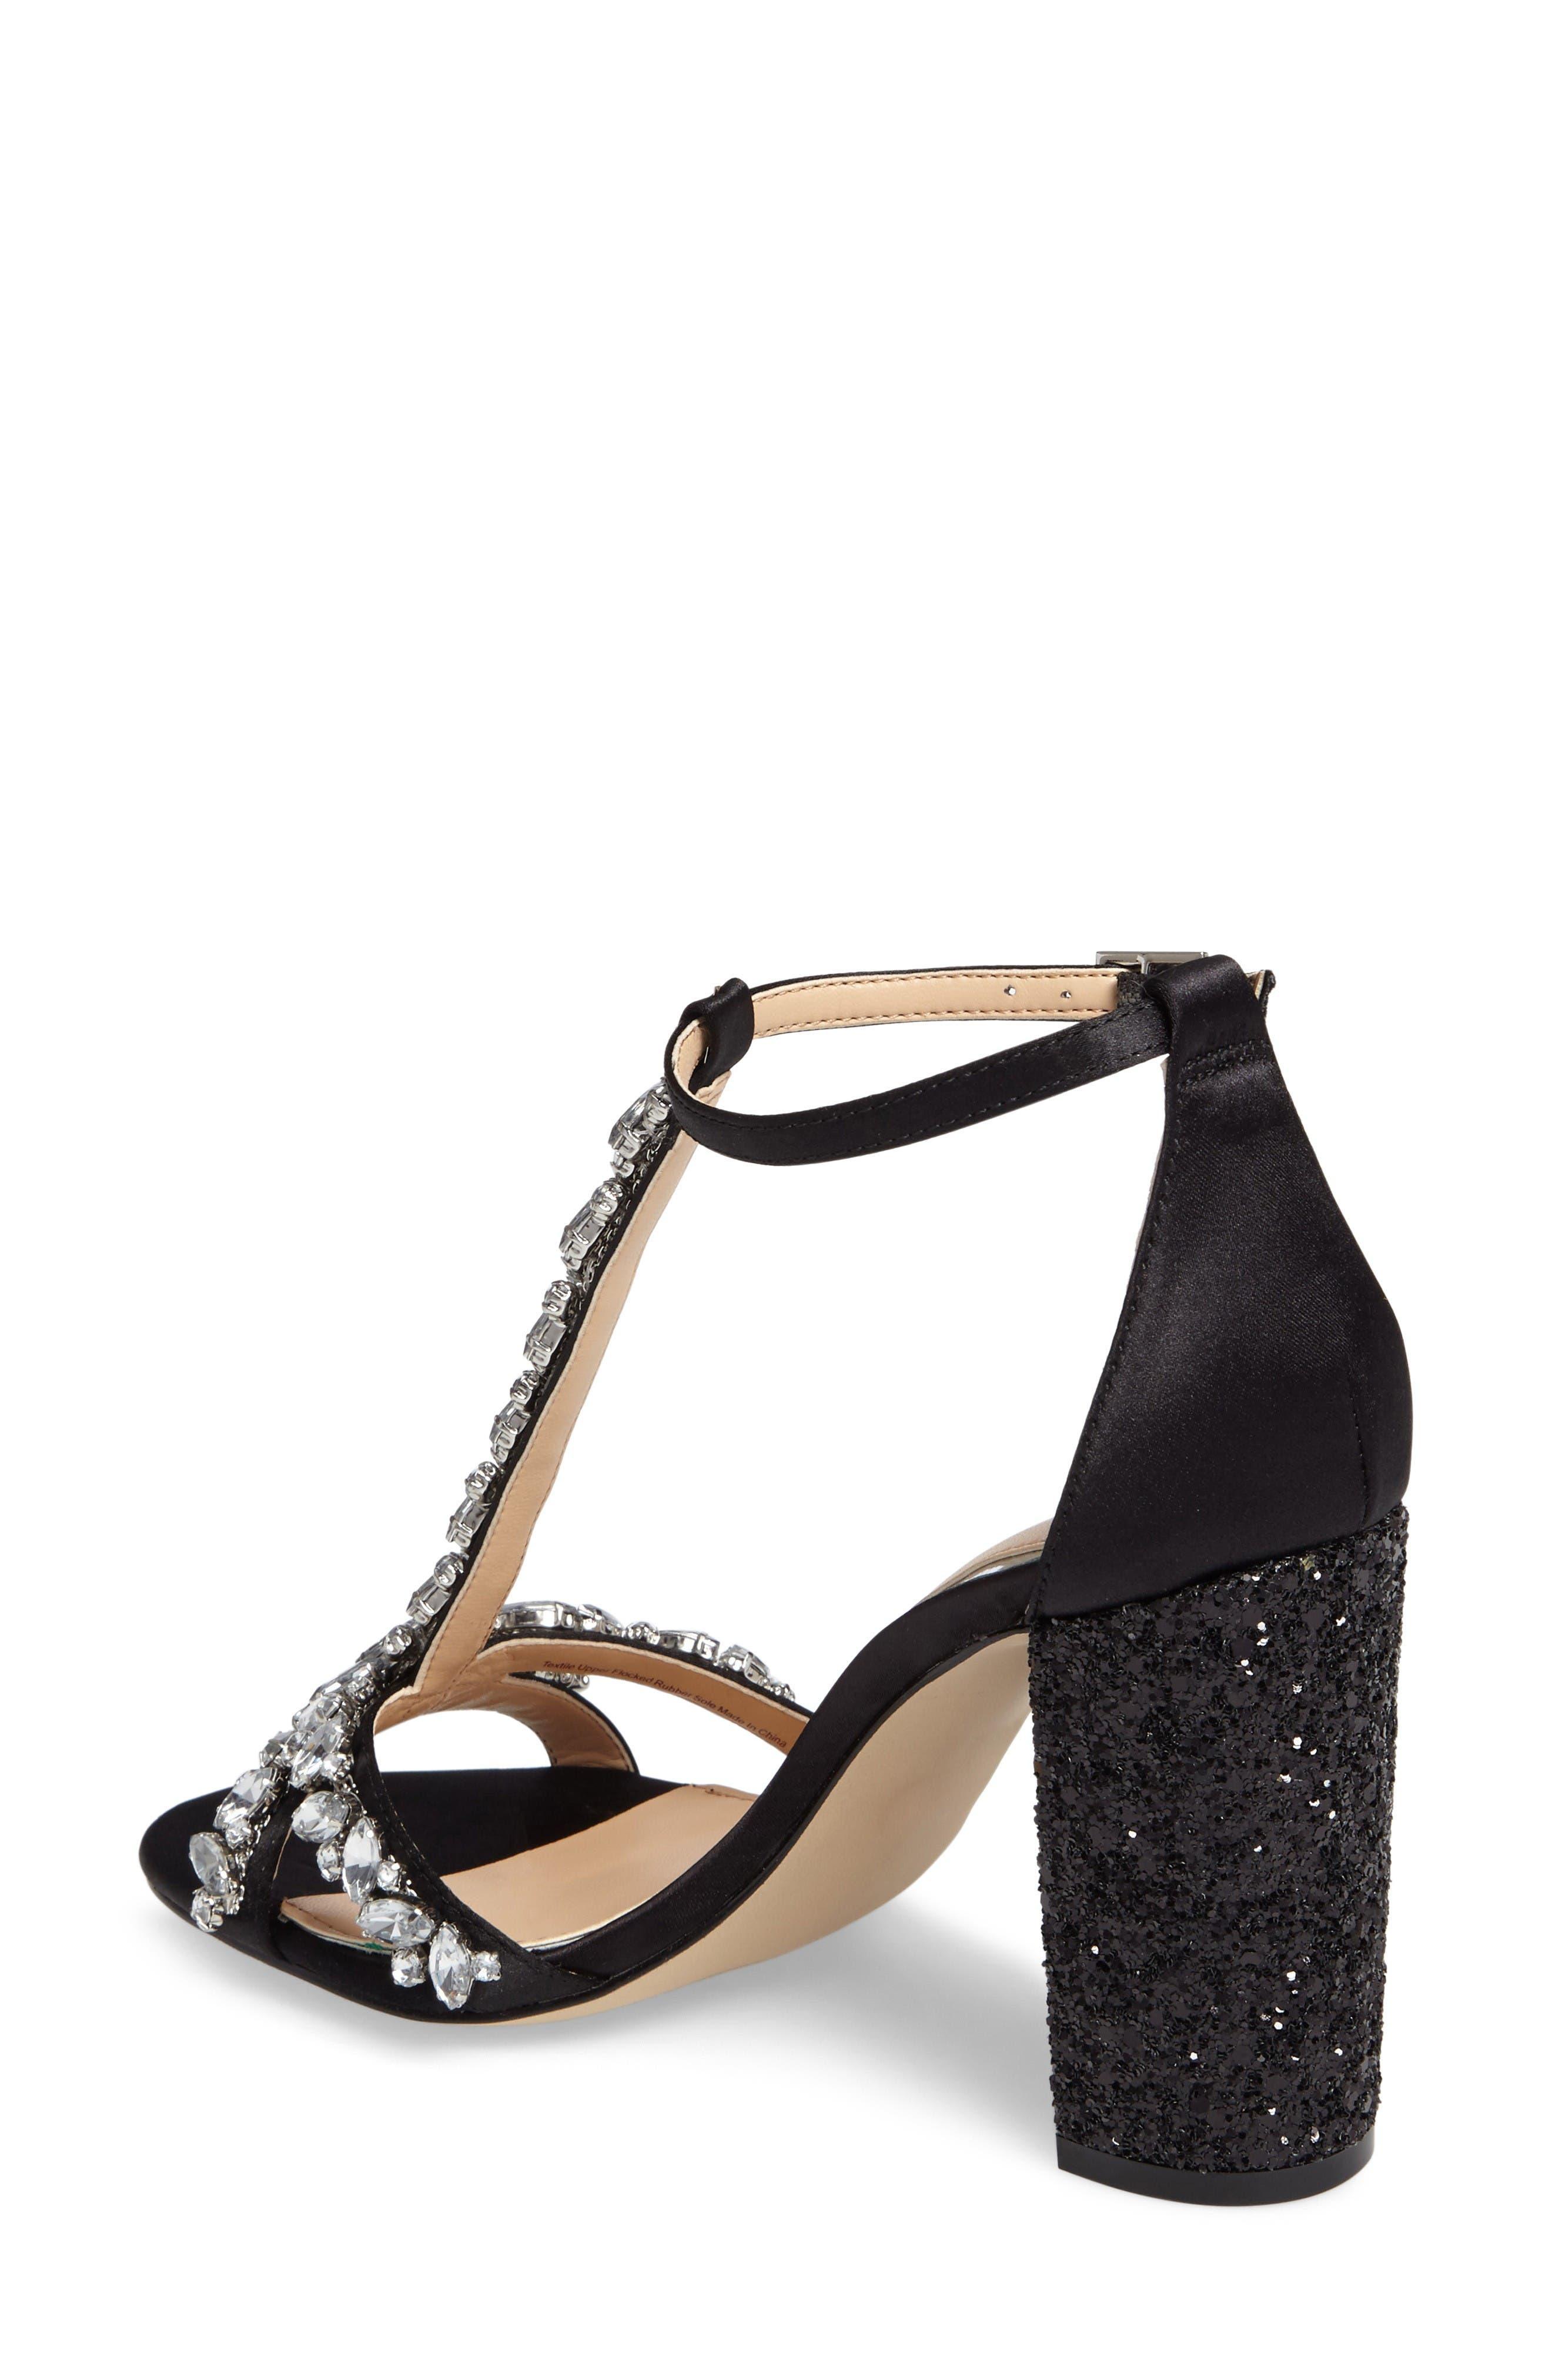 Carver Block Heel Sandal,                             Alternate thumbnail 2, color,                             Black Satin